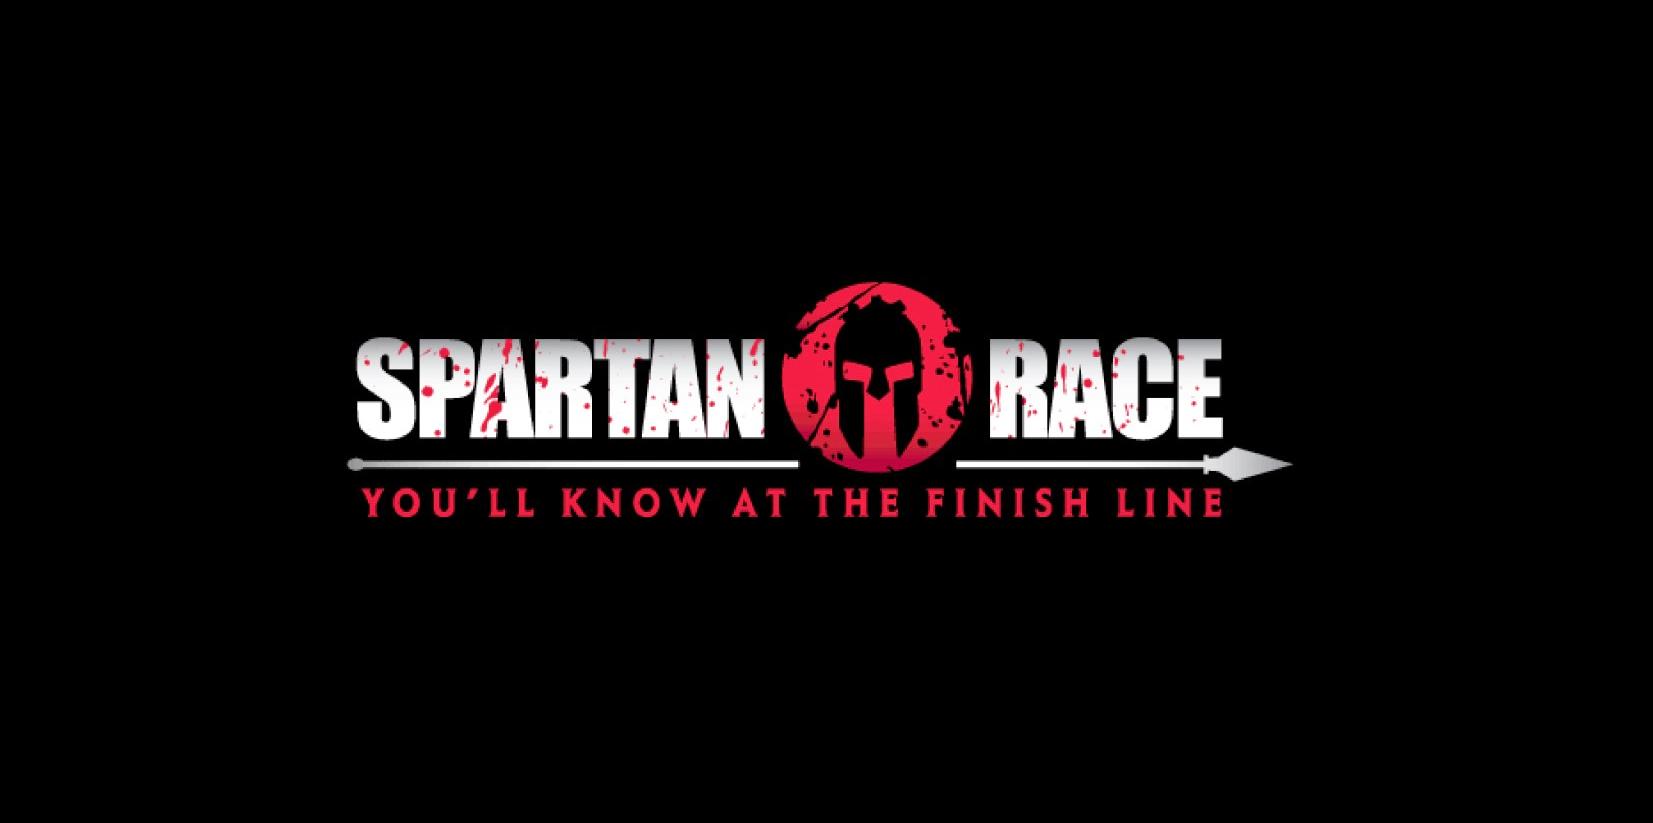 Spartan Race Logo Vector Blake graham 1653x823